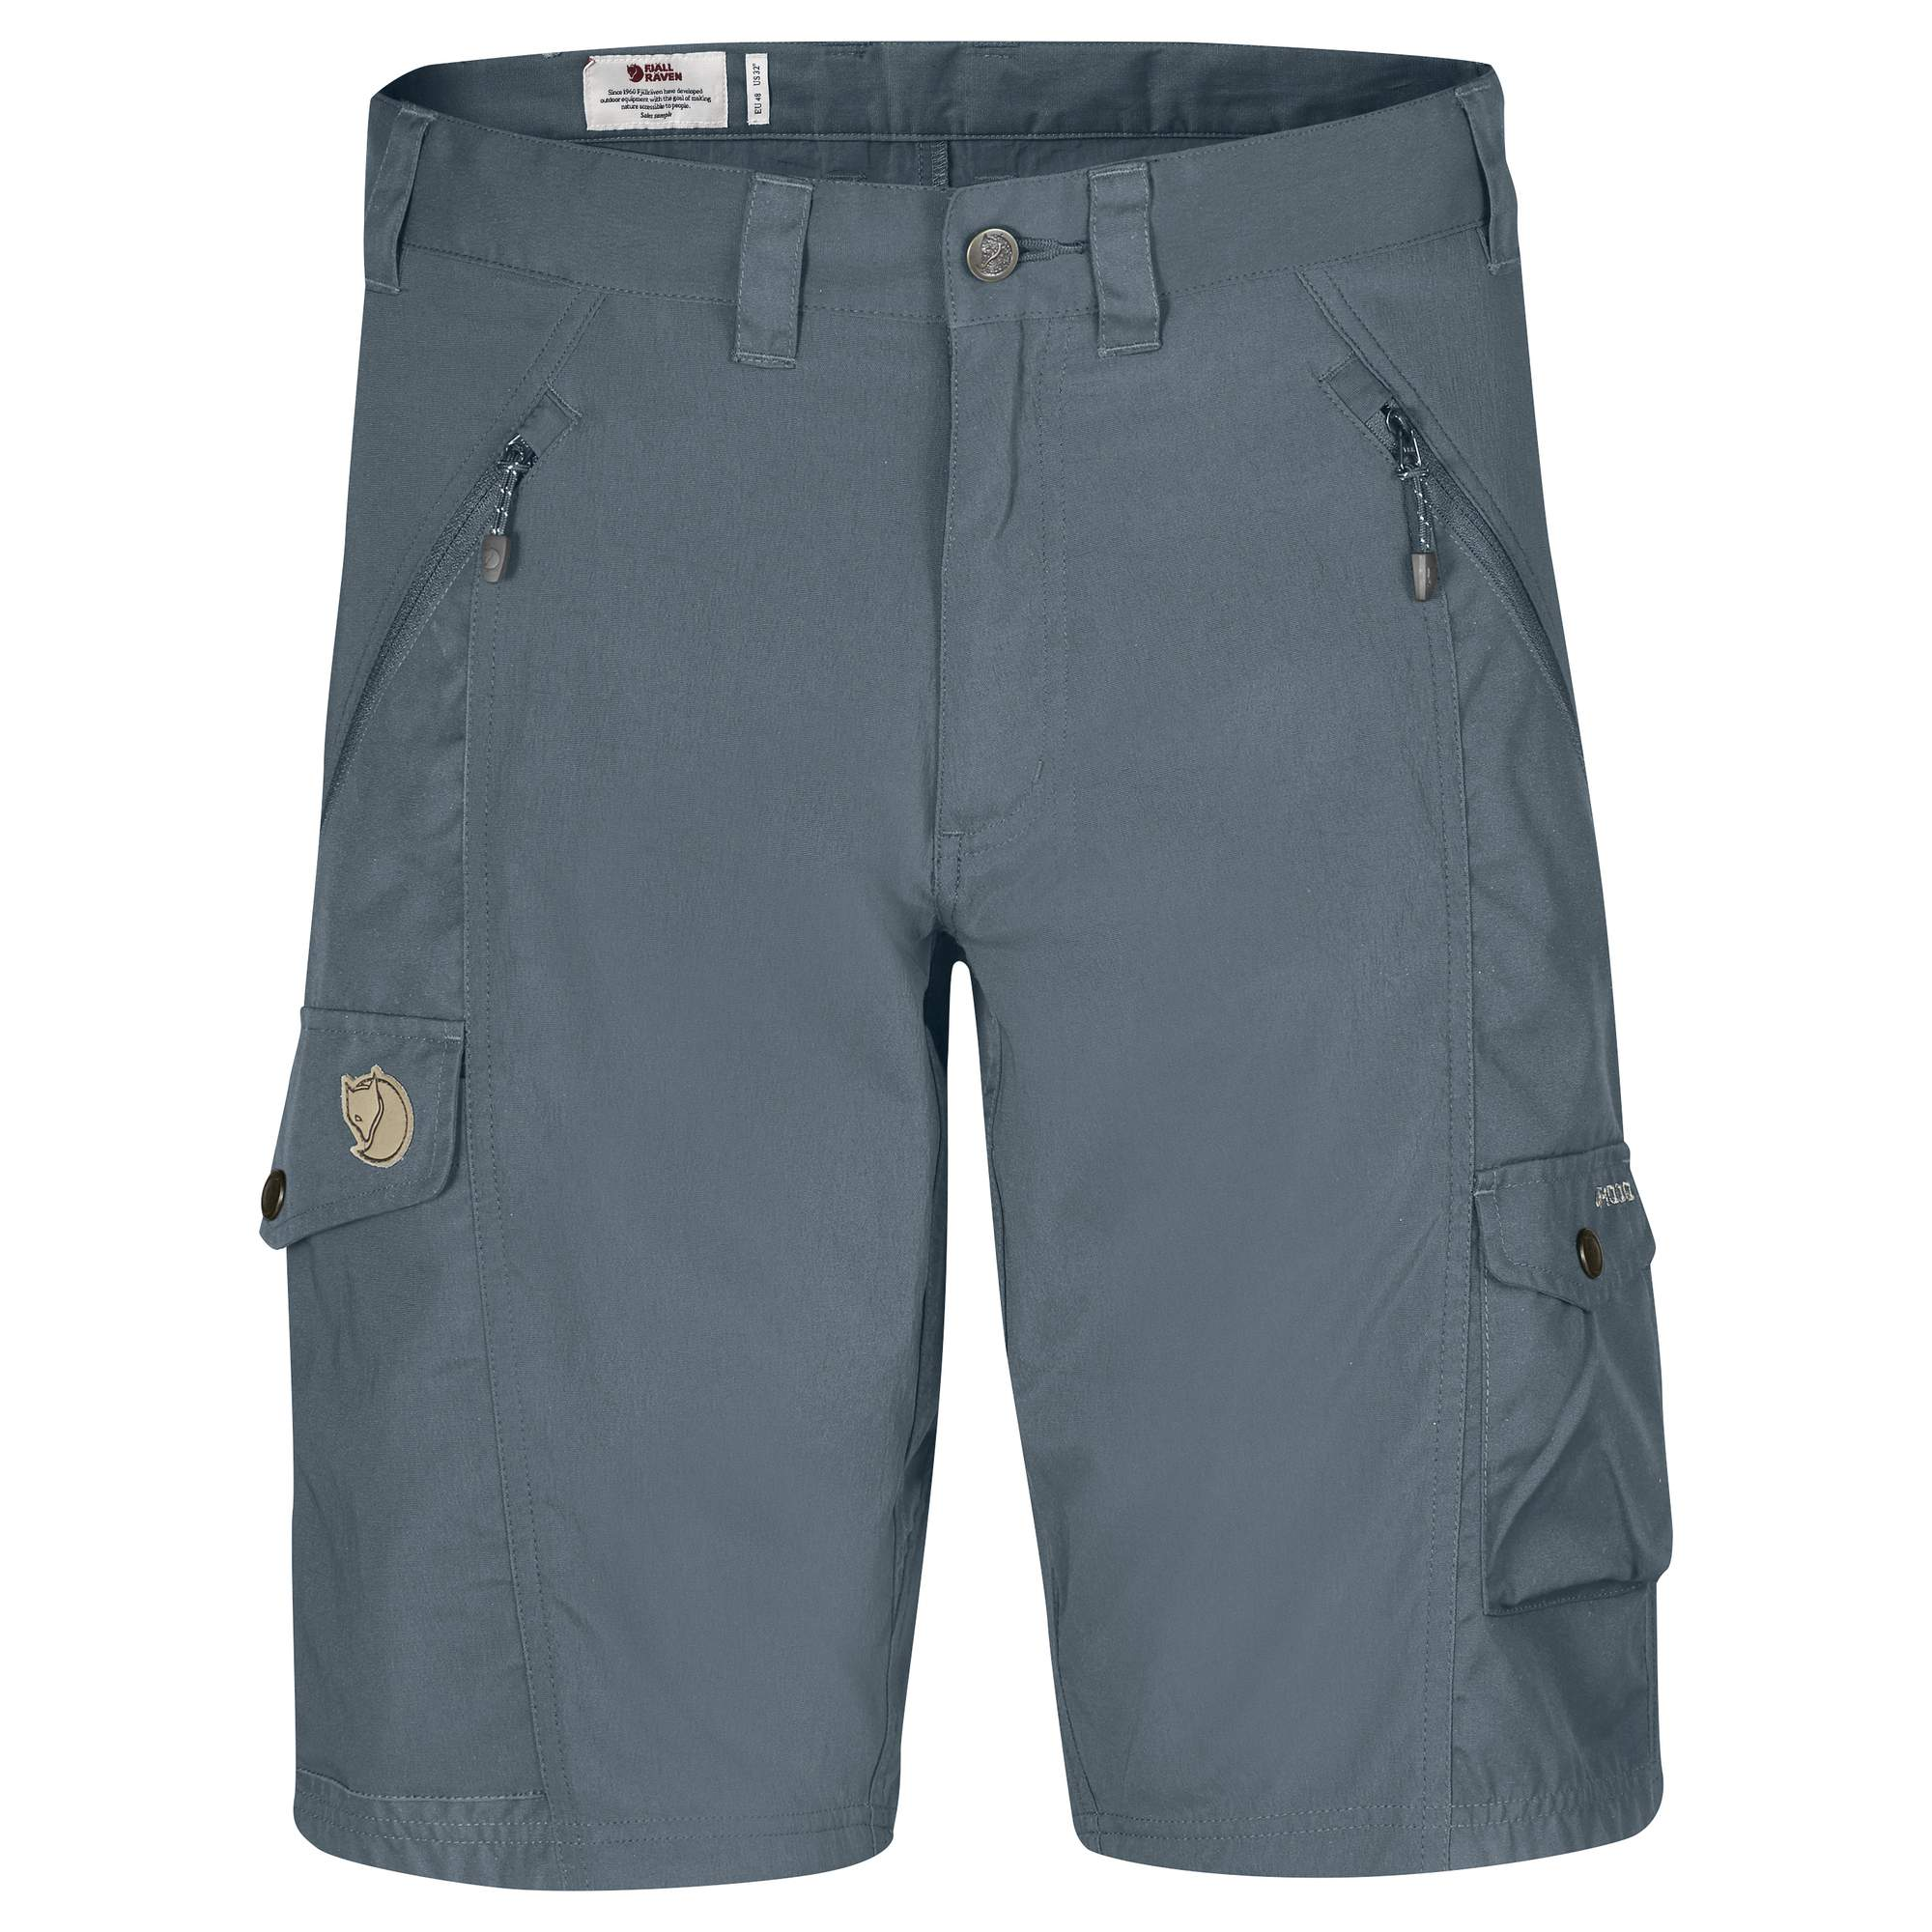 Abisko Short - Men's